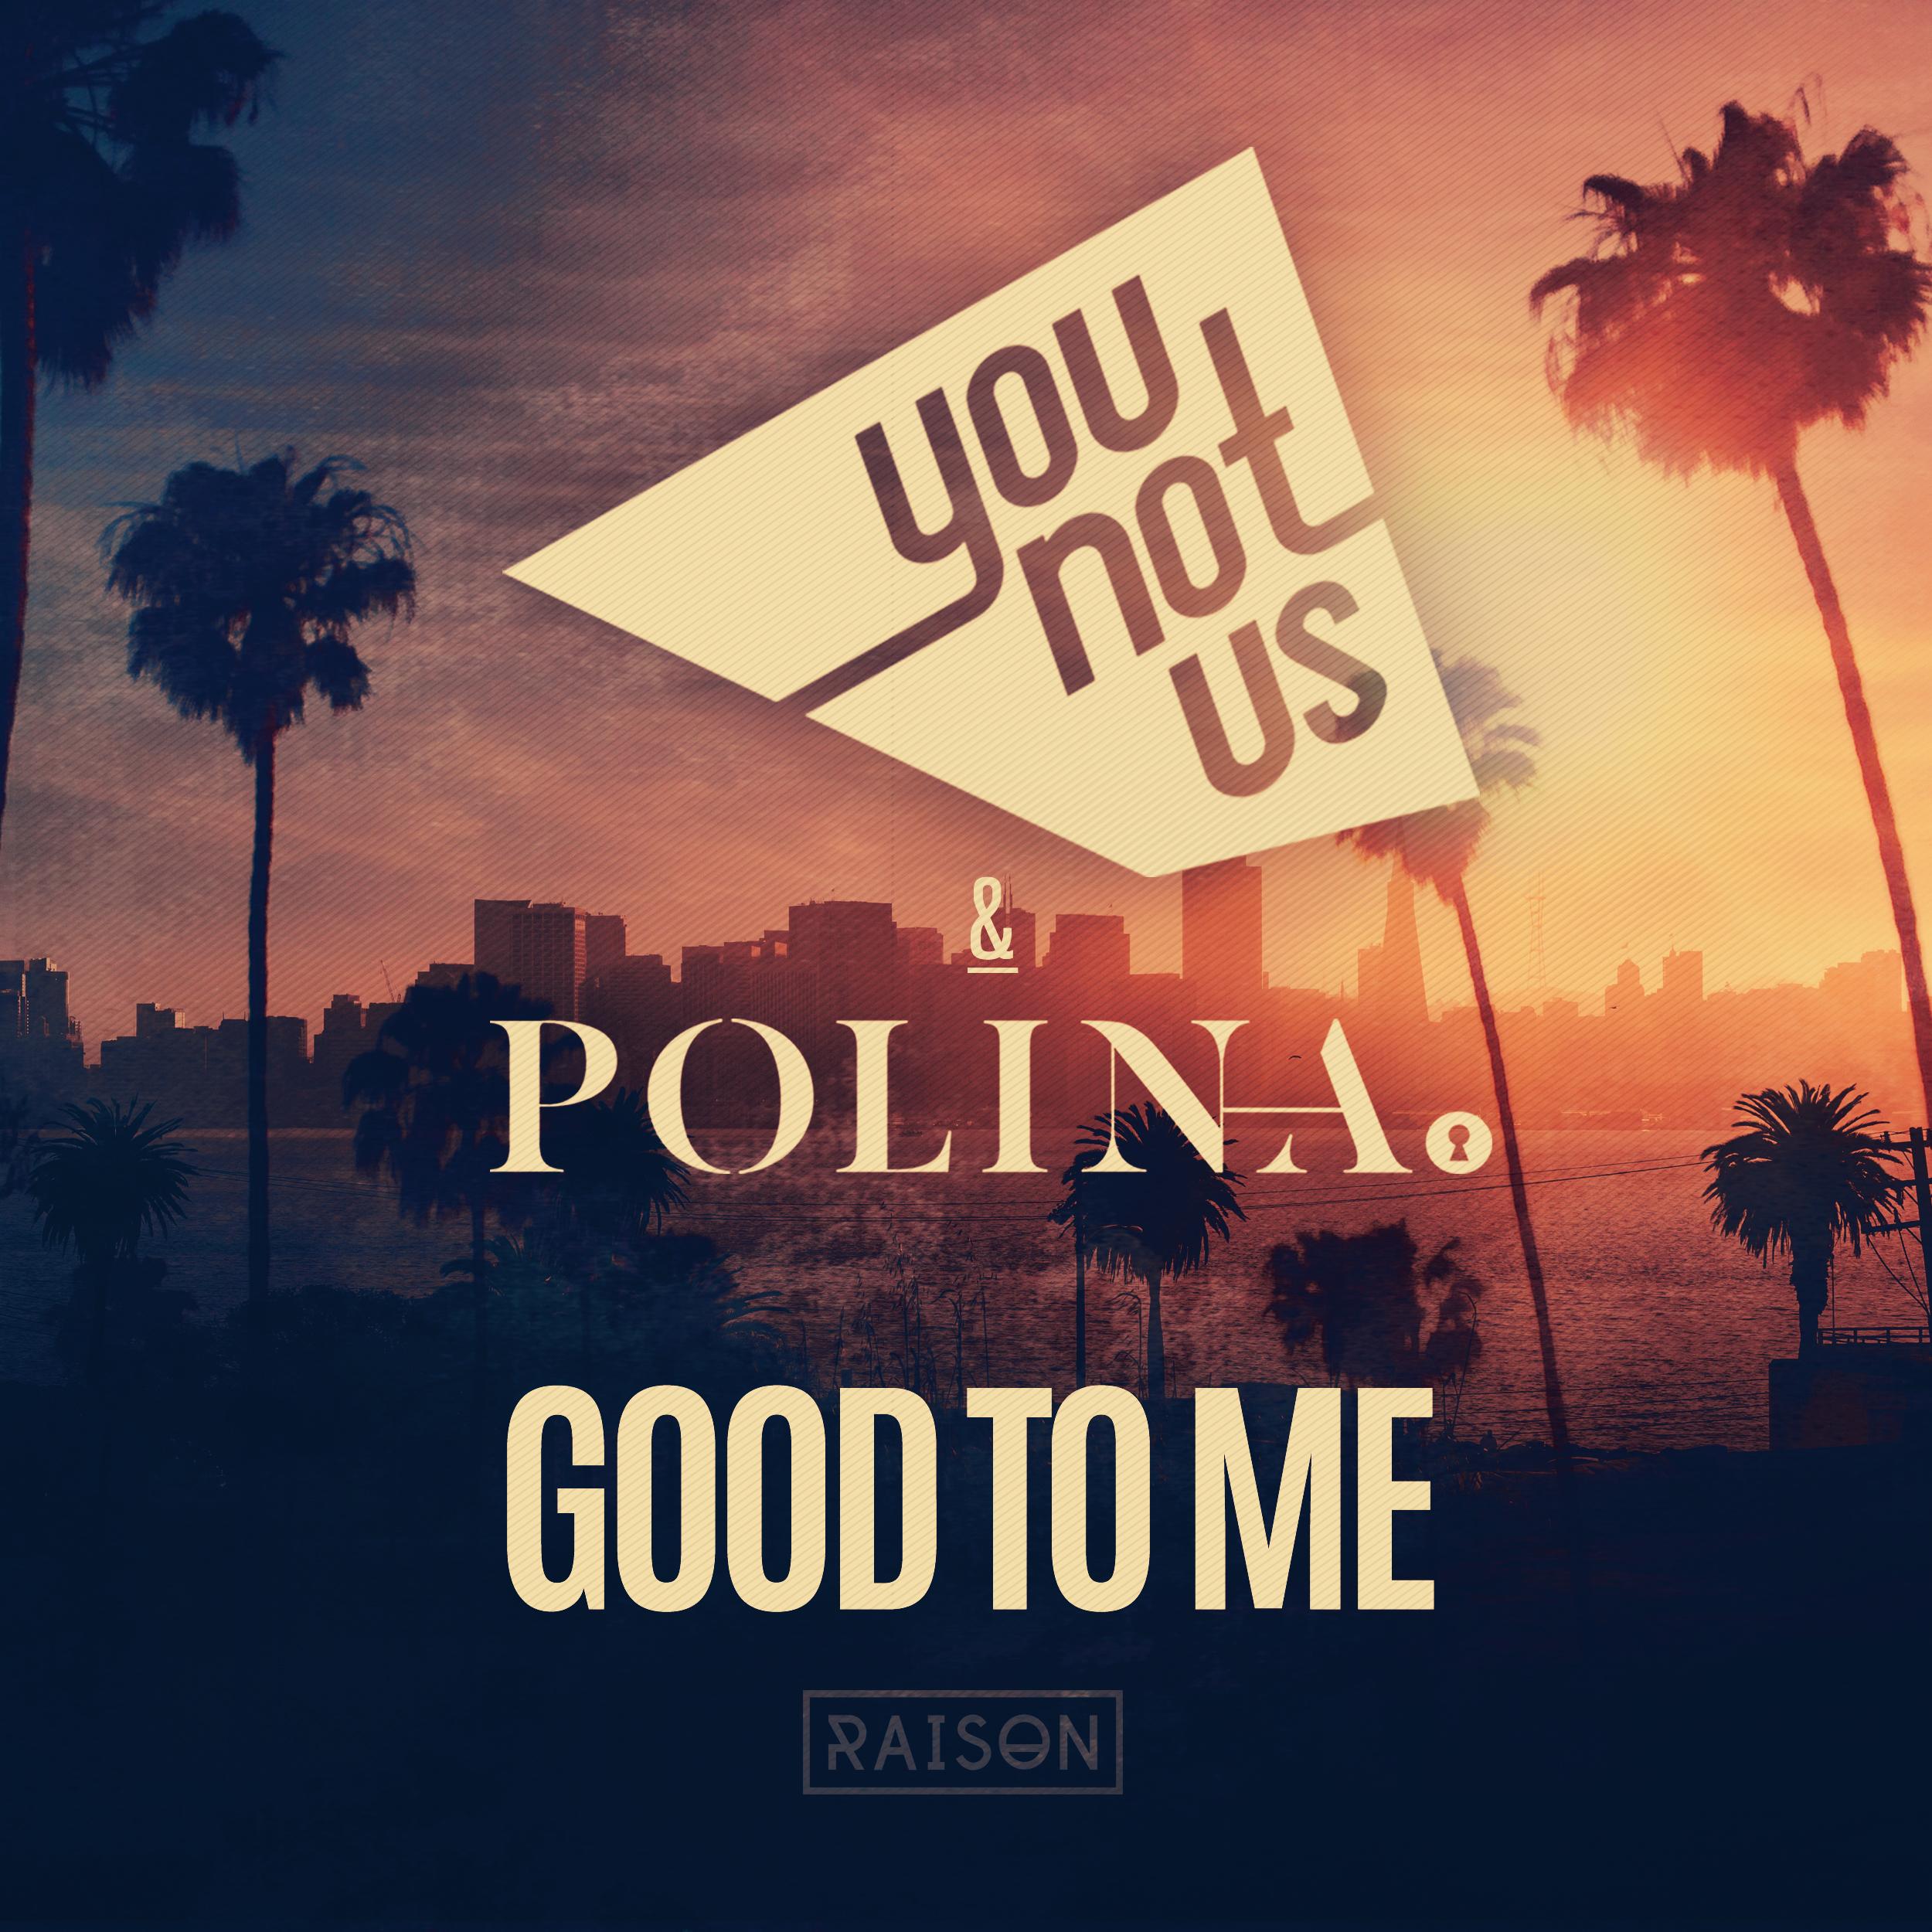 YOUNOTUS & POLINA - Good To Me (Raison)